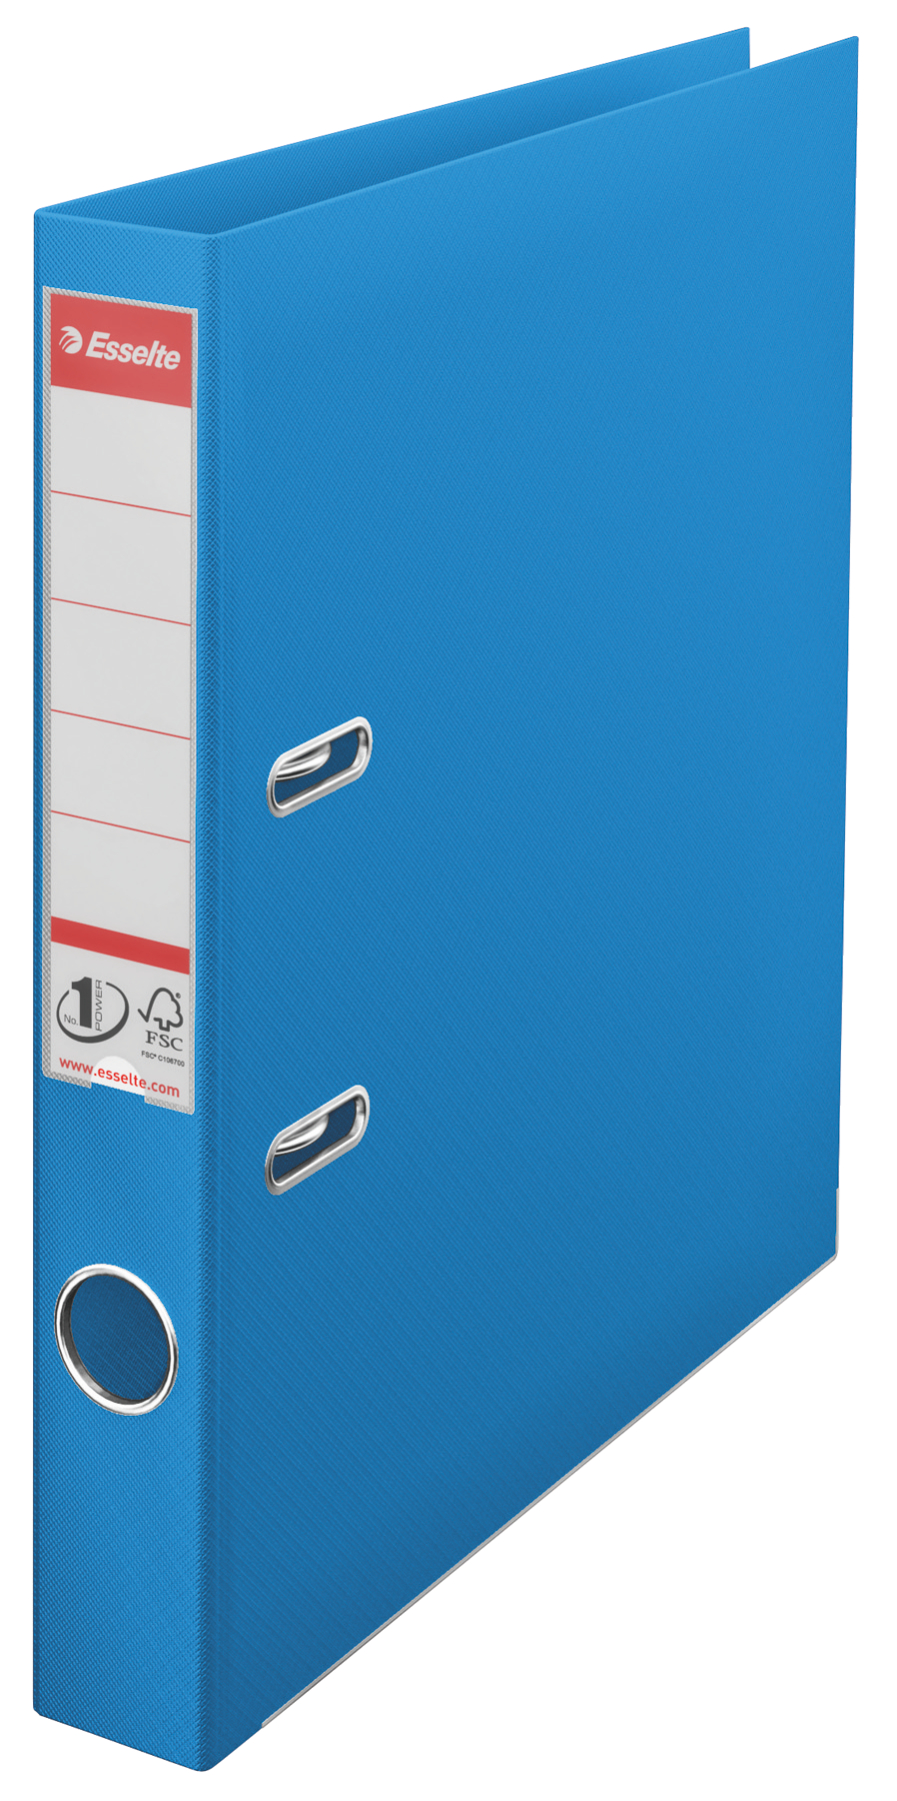 Esselte No.1 VIVIDA Lever Arch File Polypropylene A4 50mm Spine Width Blue (Pack 10) 624071